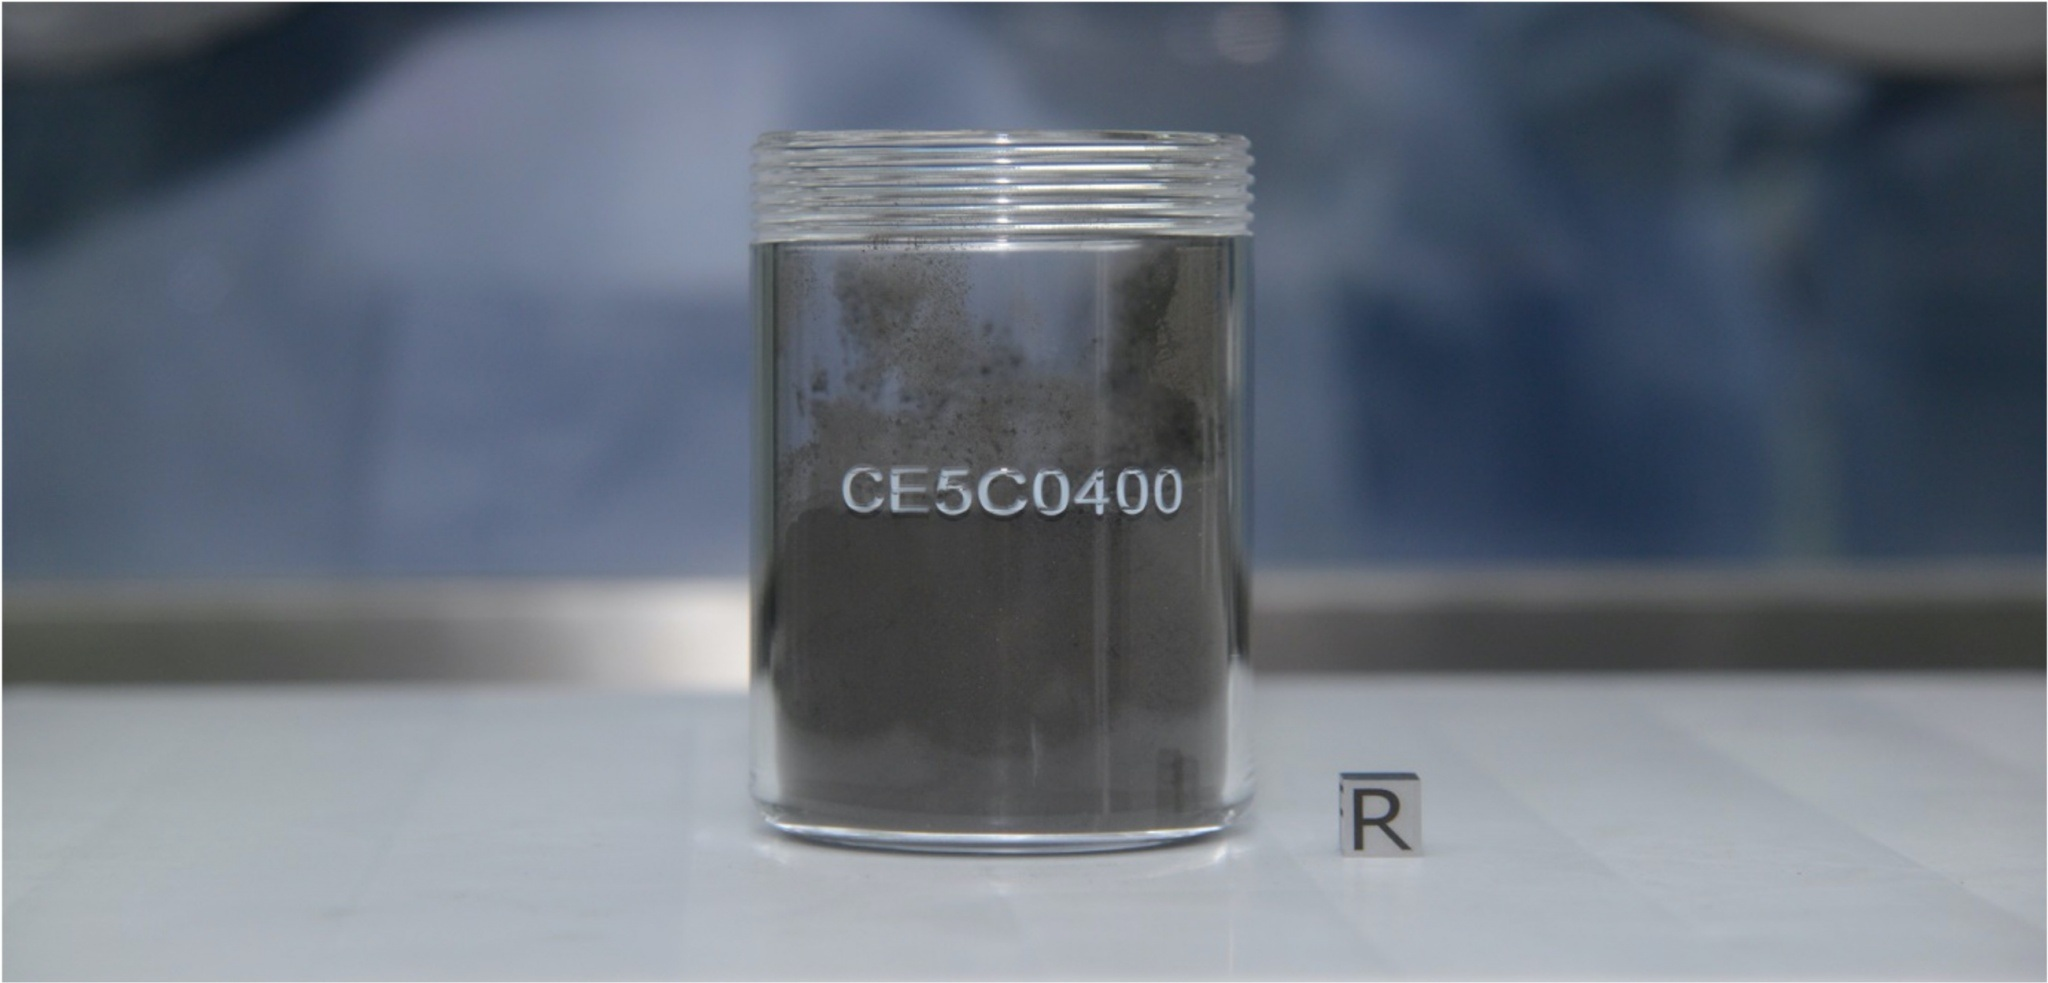 Il campione CE5C0400 di regolite lunare. Questo materiale pesa un totale di 35 grammi. Credits: CNSA (China National Space Administration) / CLEP (China Lunar Exploration Program) / GRAS (Ground Research Application System)